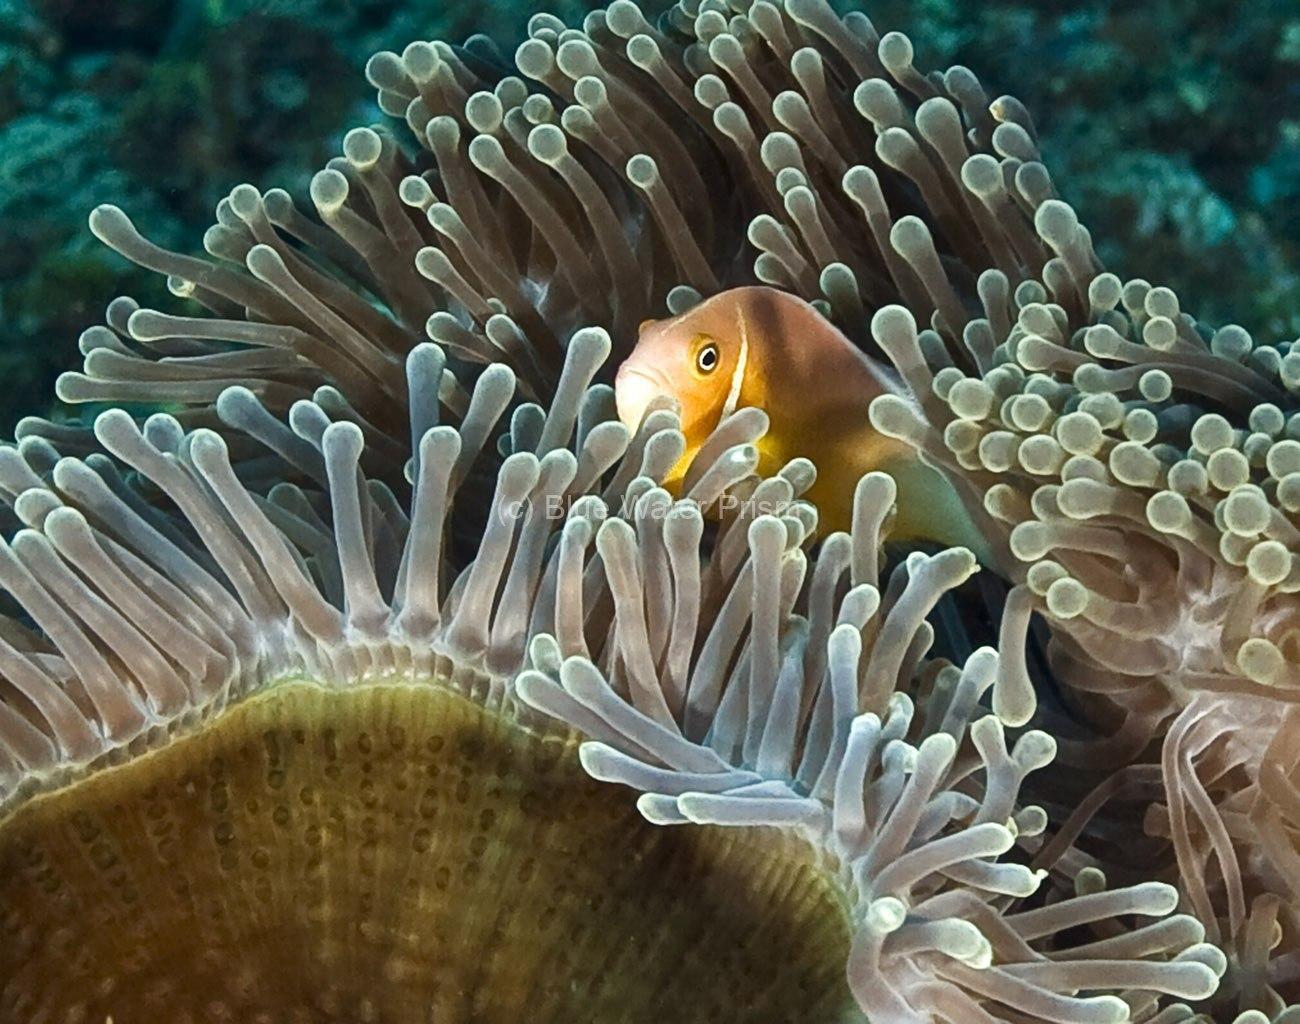 Anemonefish hiding in its anemone